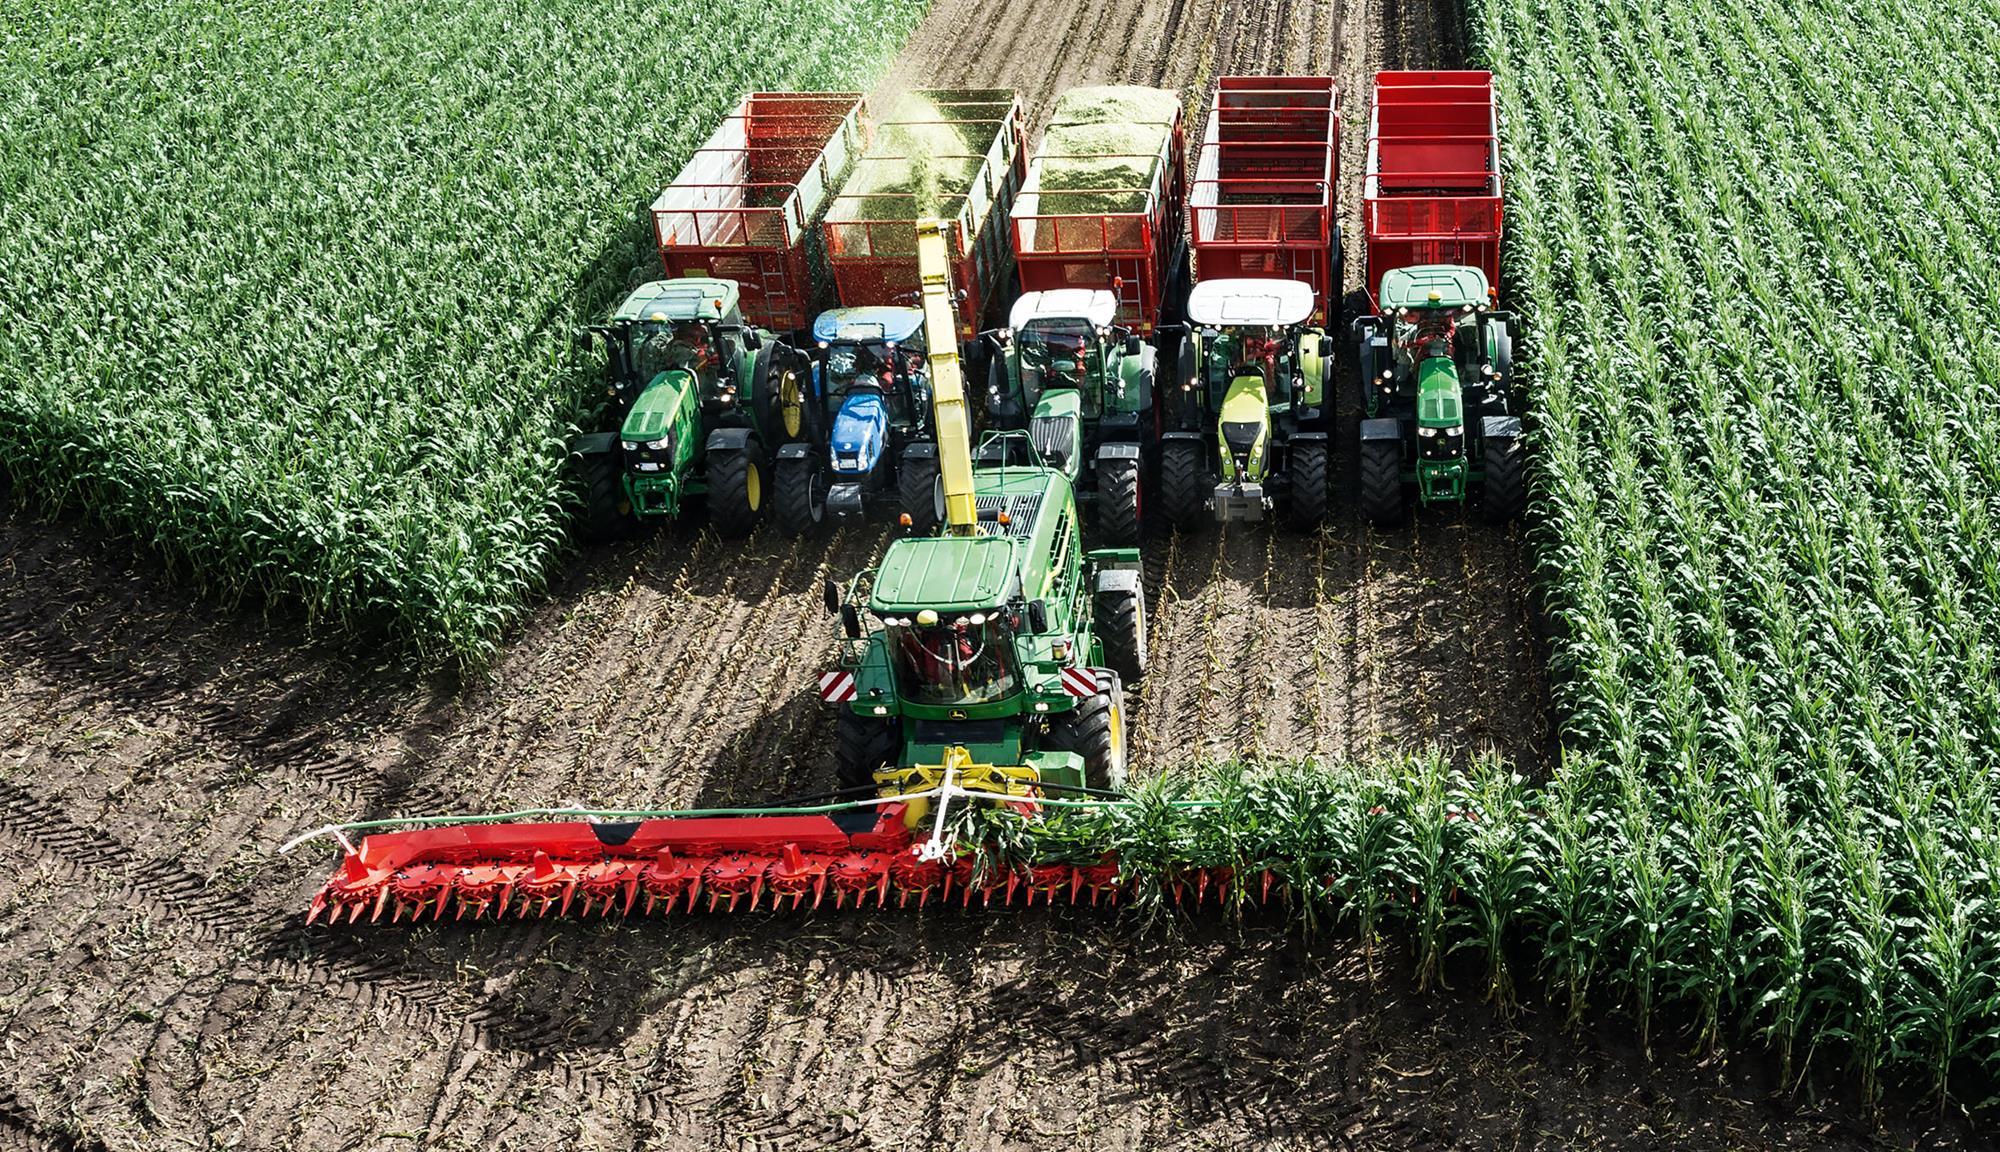 Magazine: Kemper Study 2020 – Gaan we 20 rijen maïs hakselen?